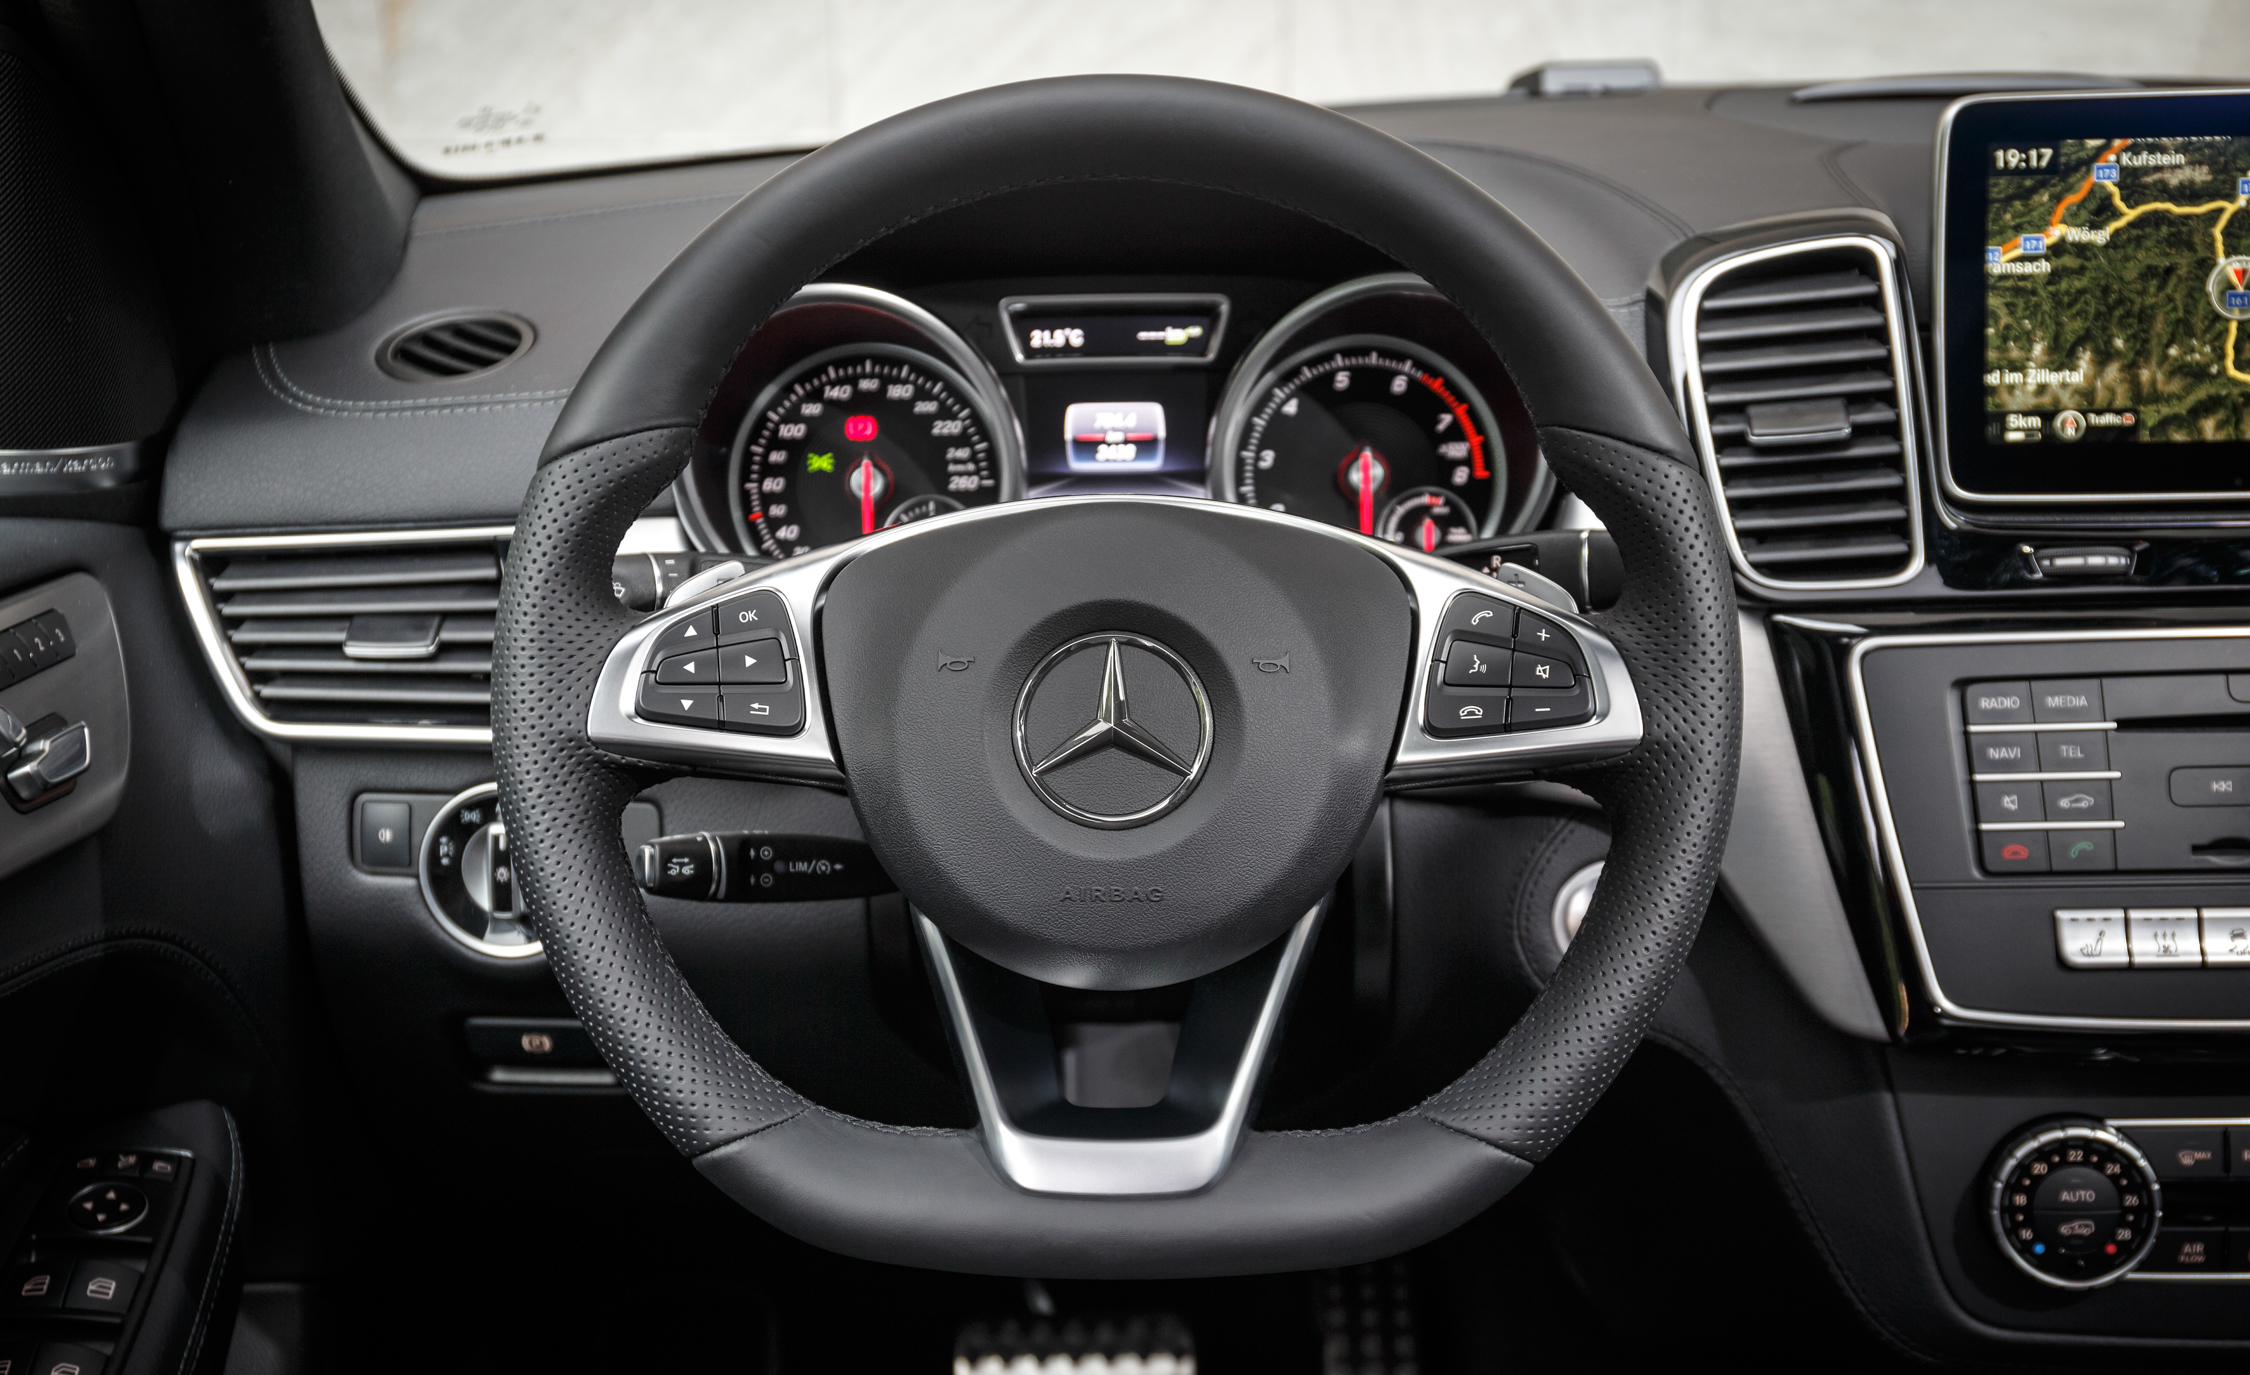 2016 Mercedes-Benz GLE500e 4MATIC Interior Cockpit #7581 | Cars ... | {Auto cockpit mercedes 19}